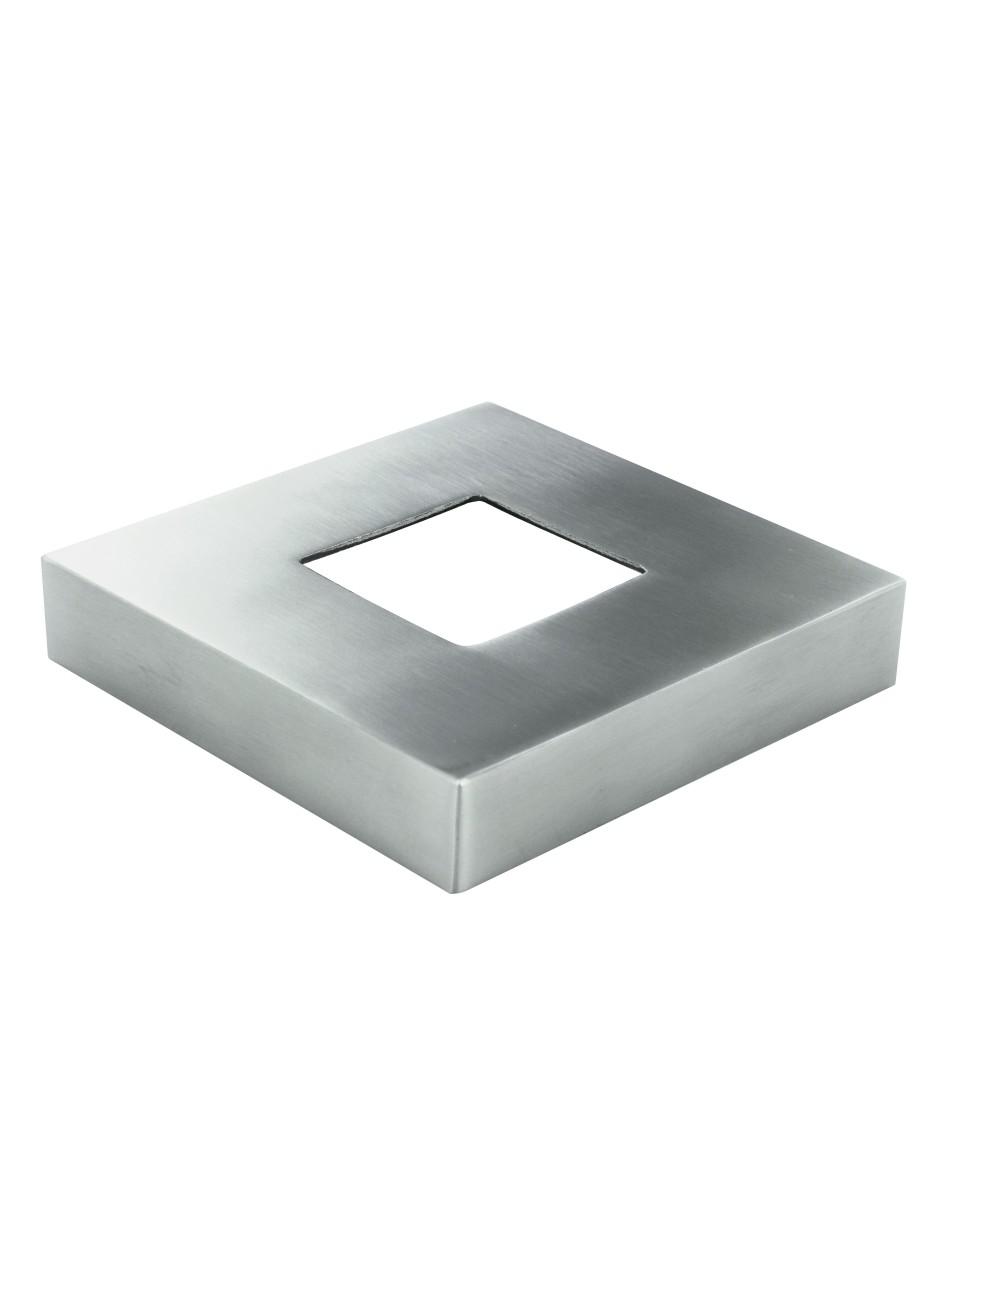 Piastre-di-copertura-quadrate